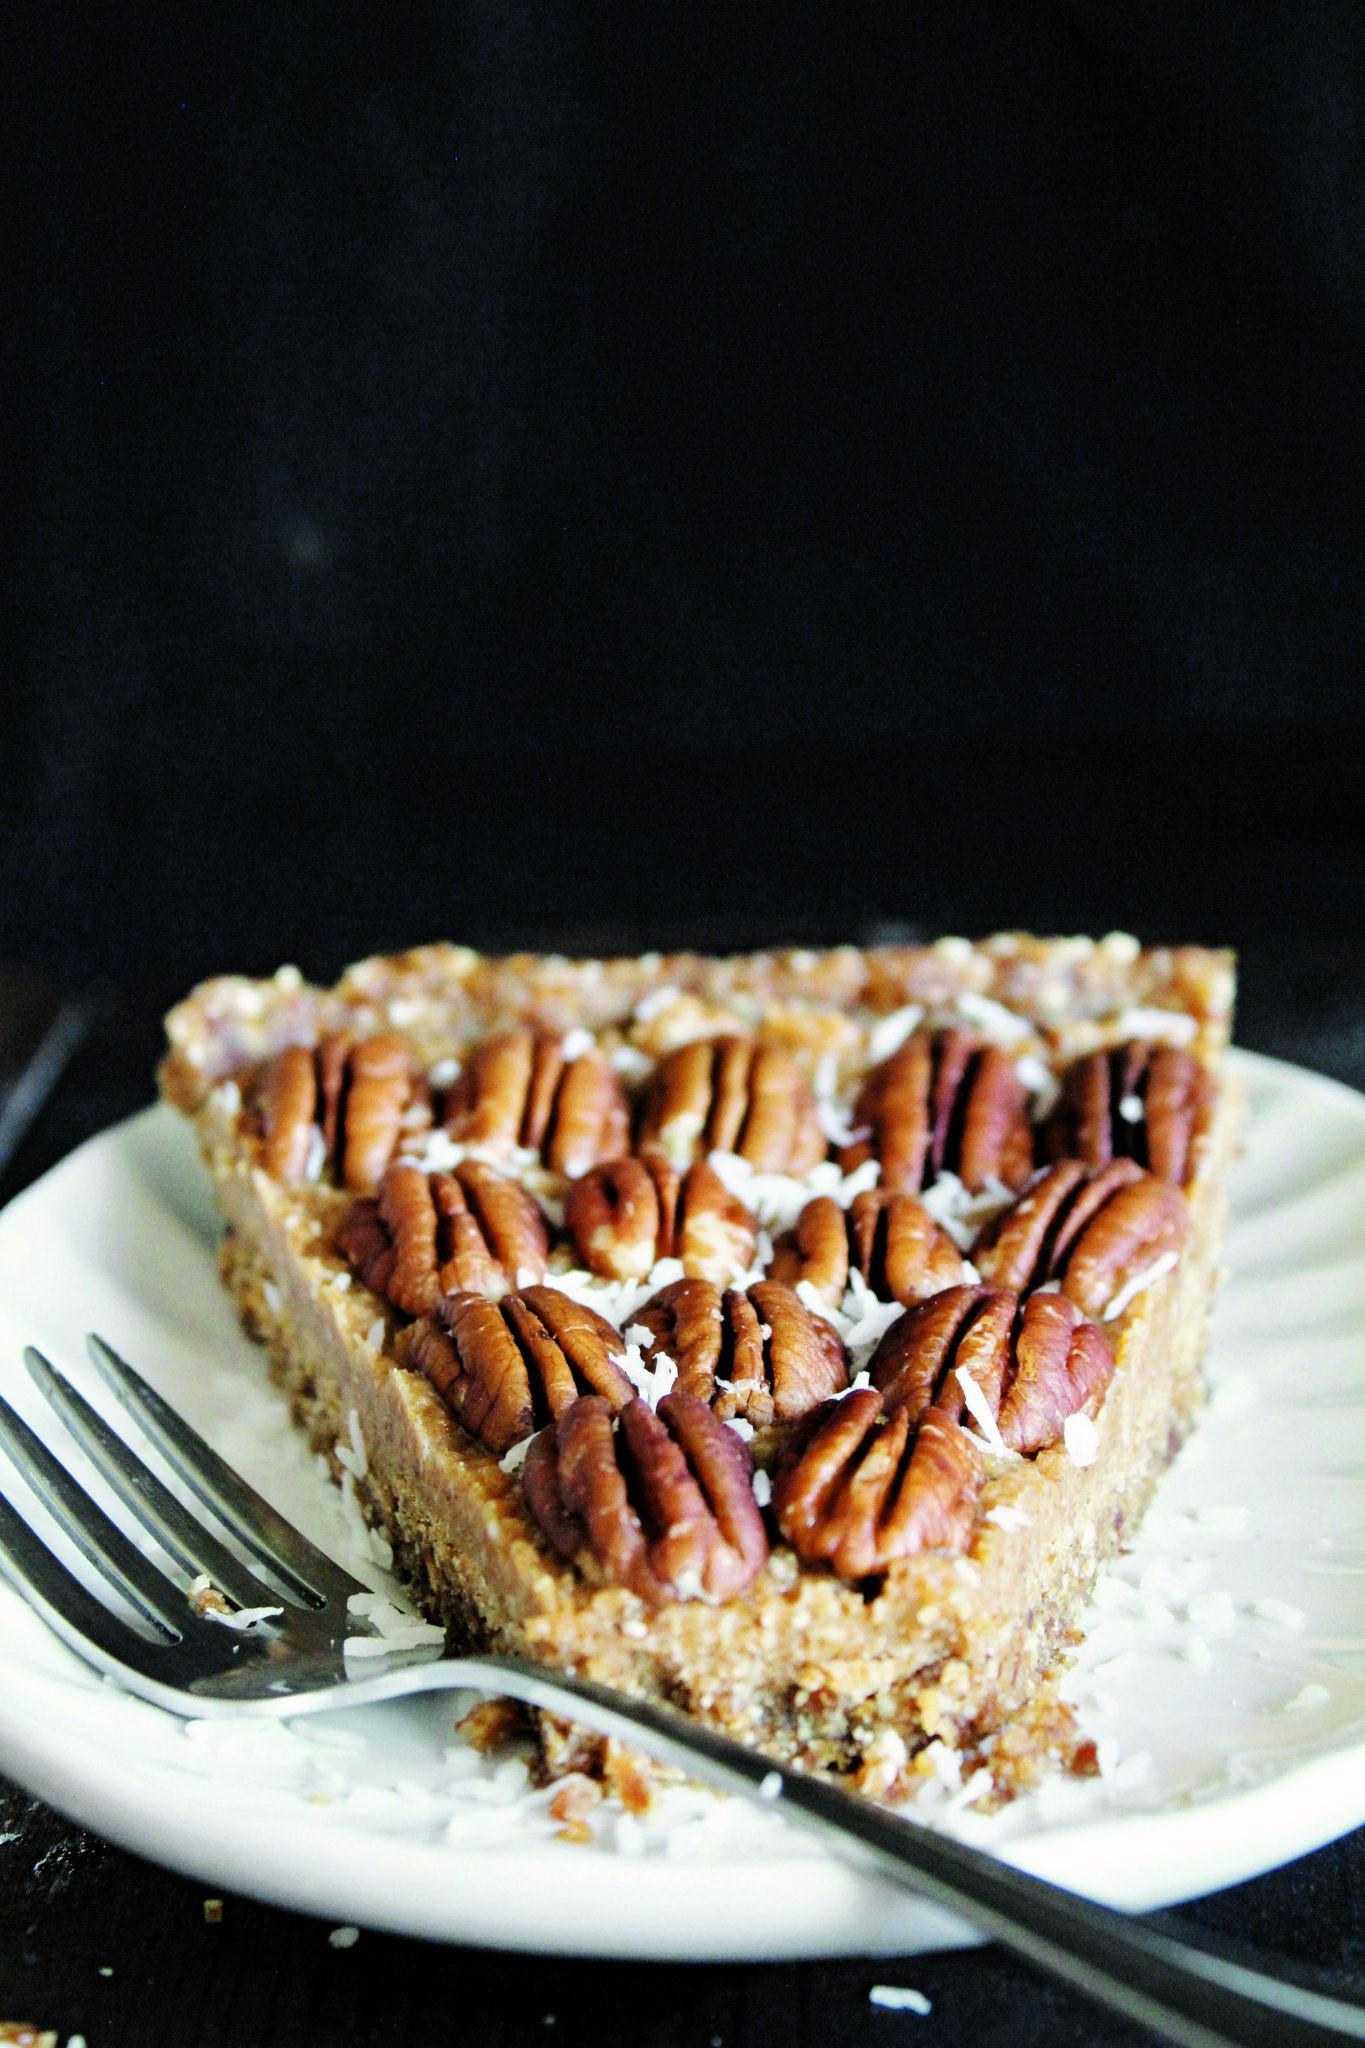 Organic Pecan Pie  Raw Vegan Maple Pecan Pie made with Dates Pecan and Coconut